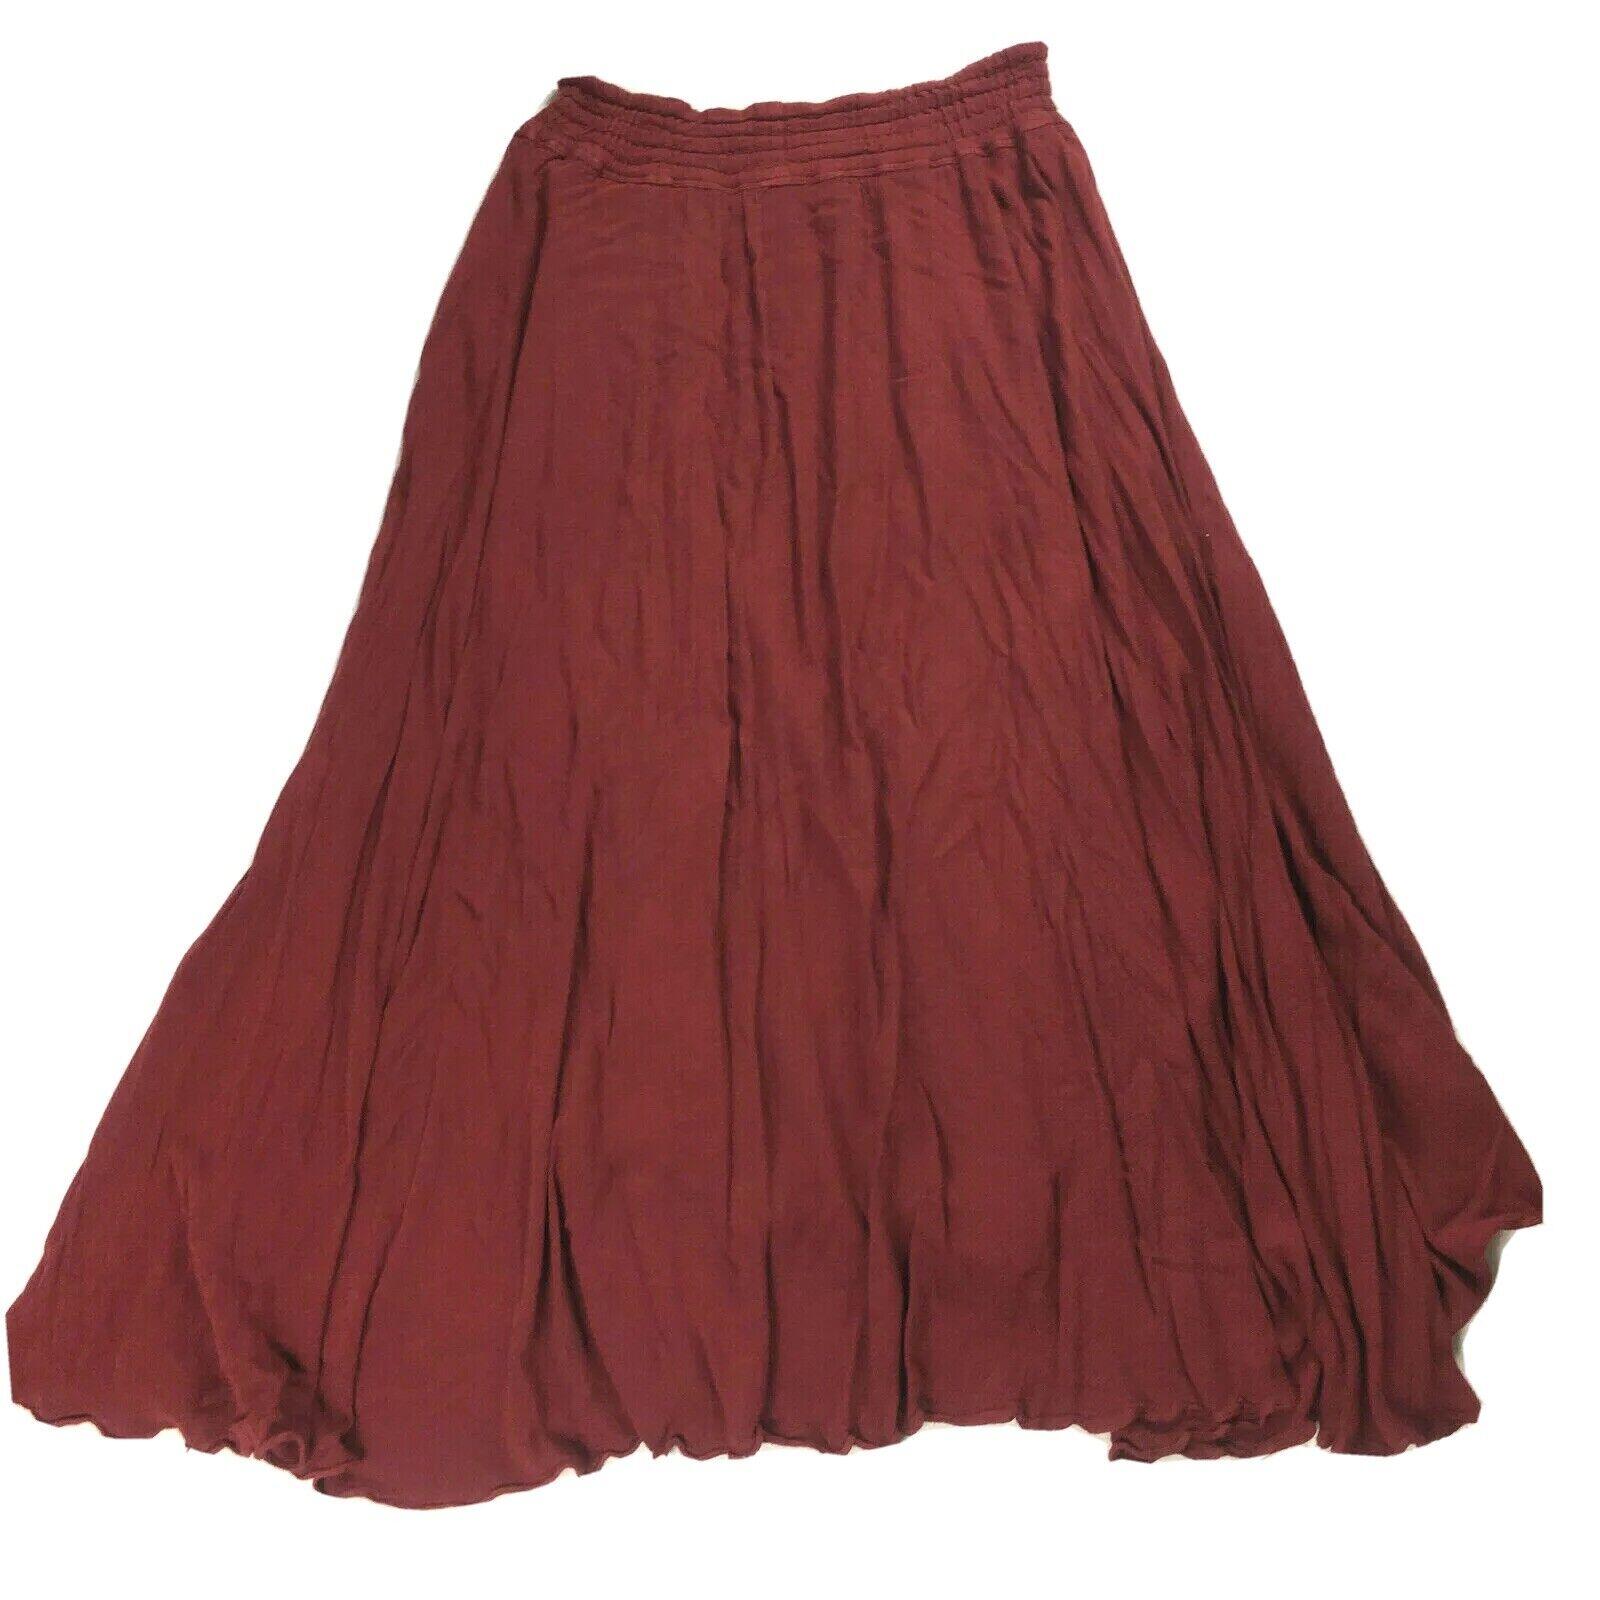 Laise Adzer Skirt Women's Small Medium Large Lage… - image 2